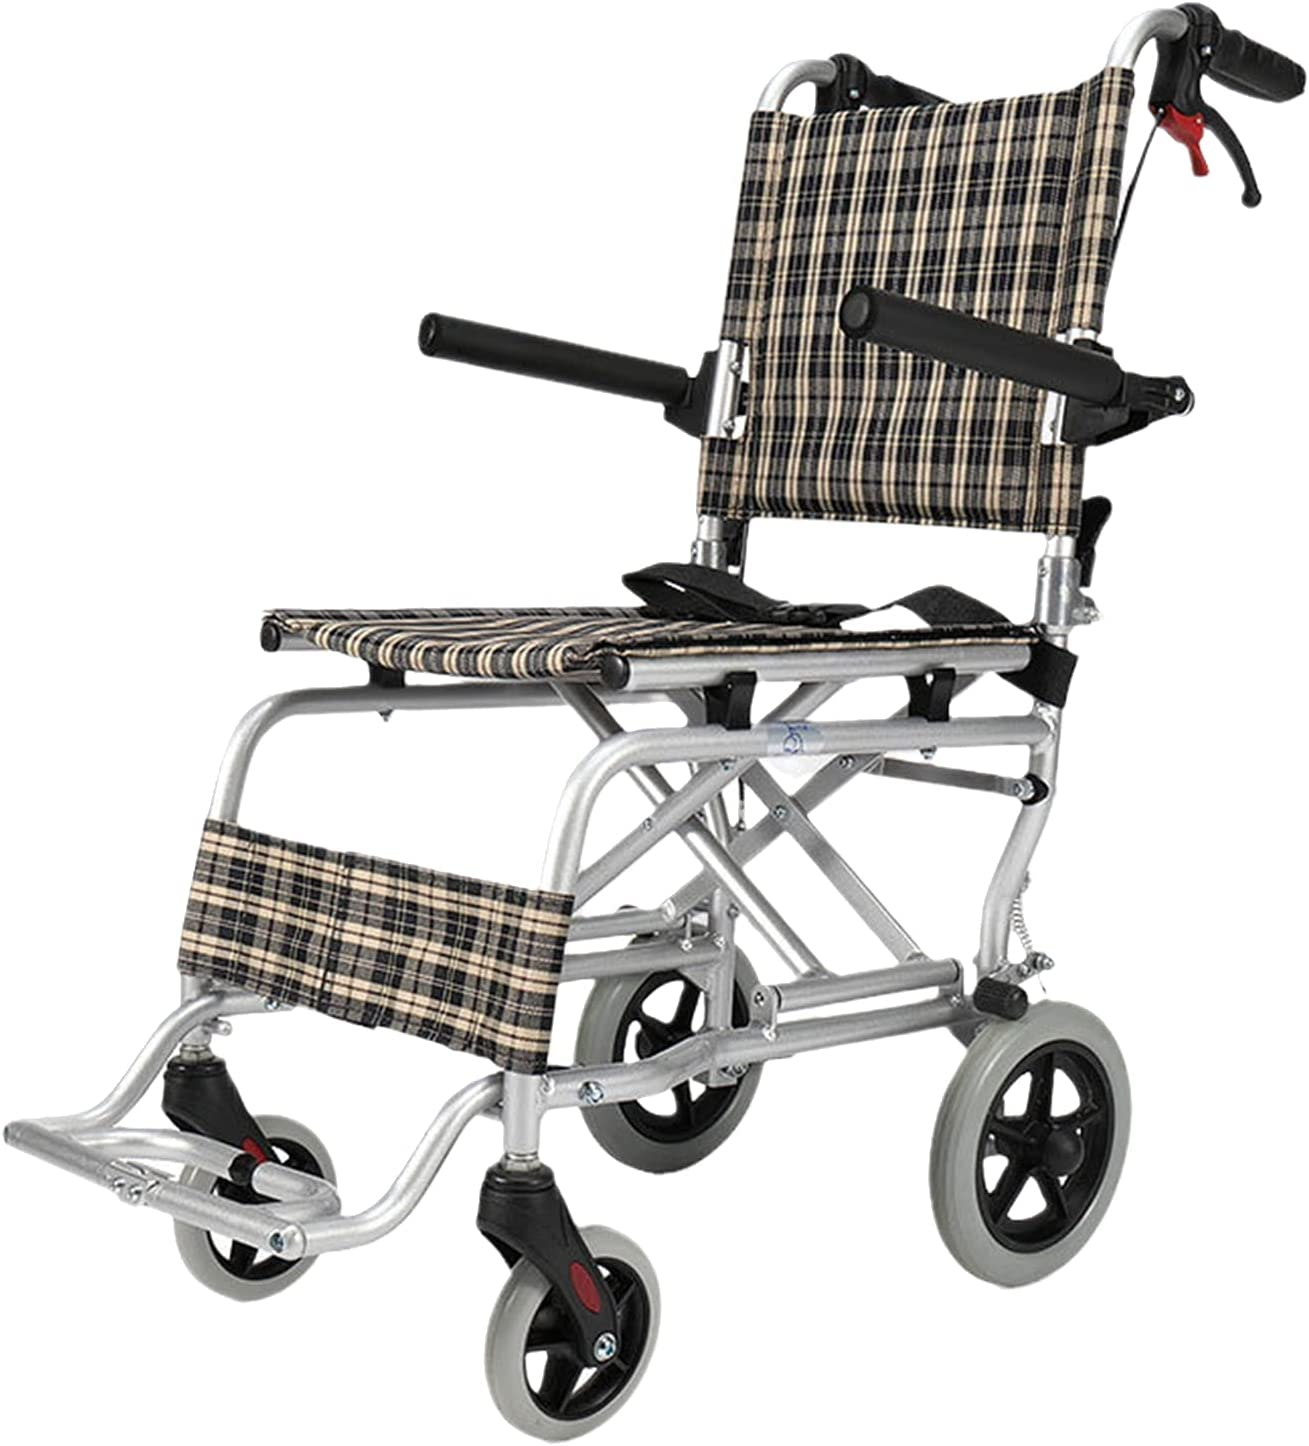 Super Light sale Folding Transport Chair Brake Tulsa Mall with Up Fold Pedalport